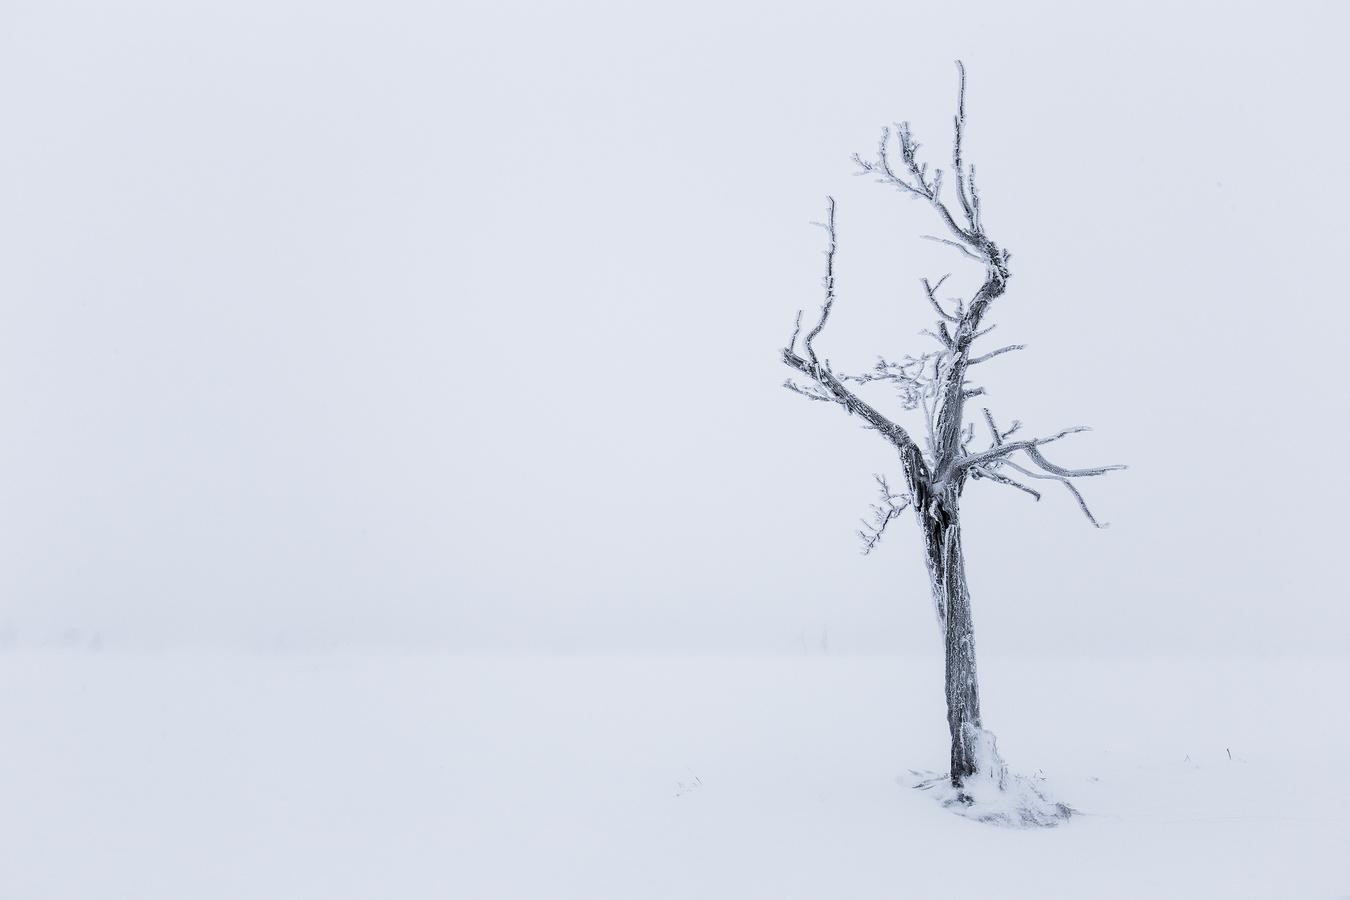 Vichřice v Krušných horách